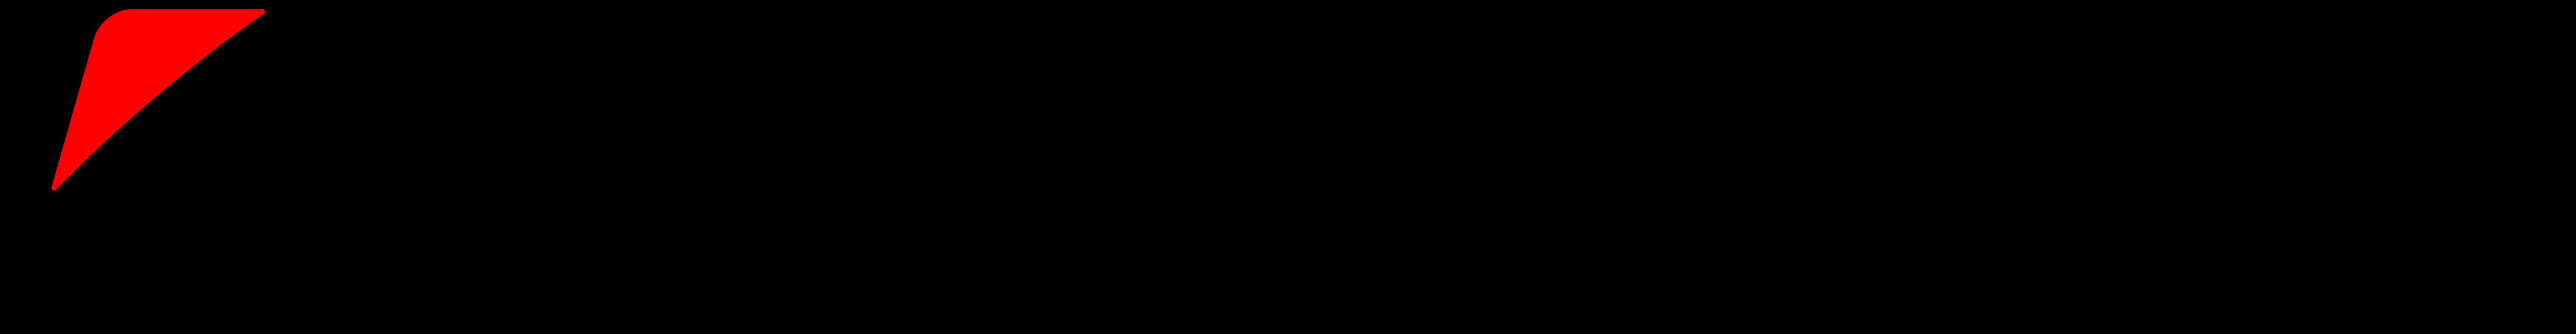 bridgestone � logos download